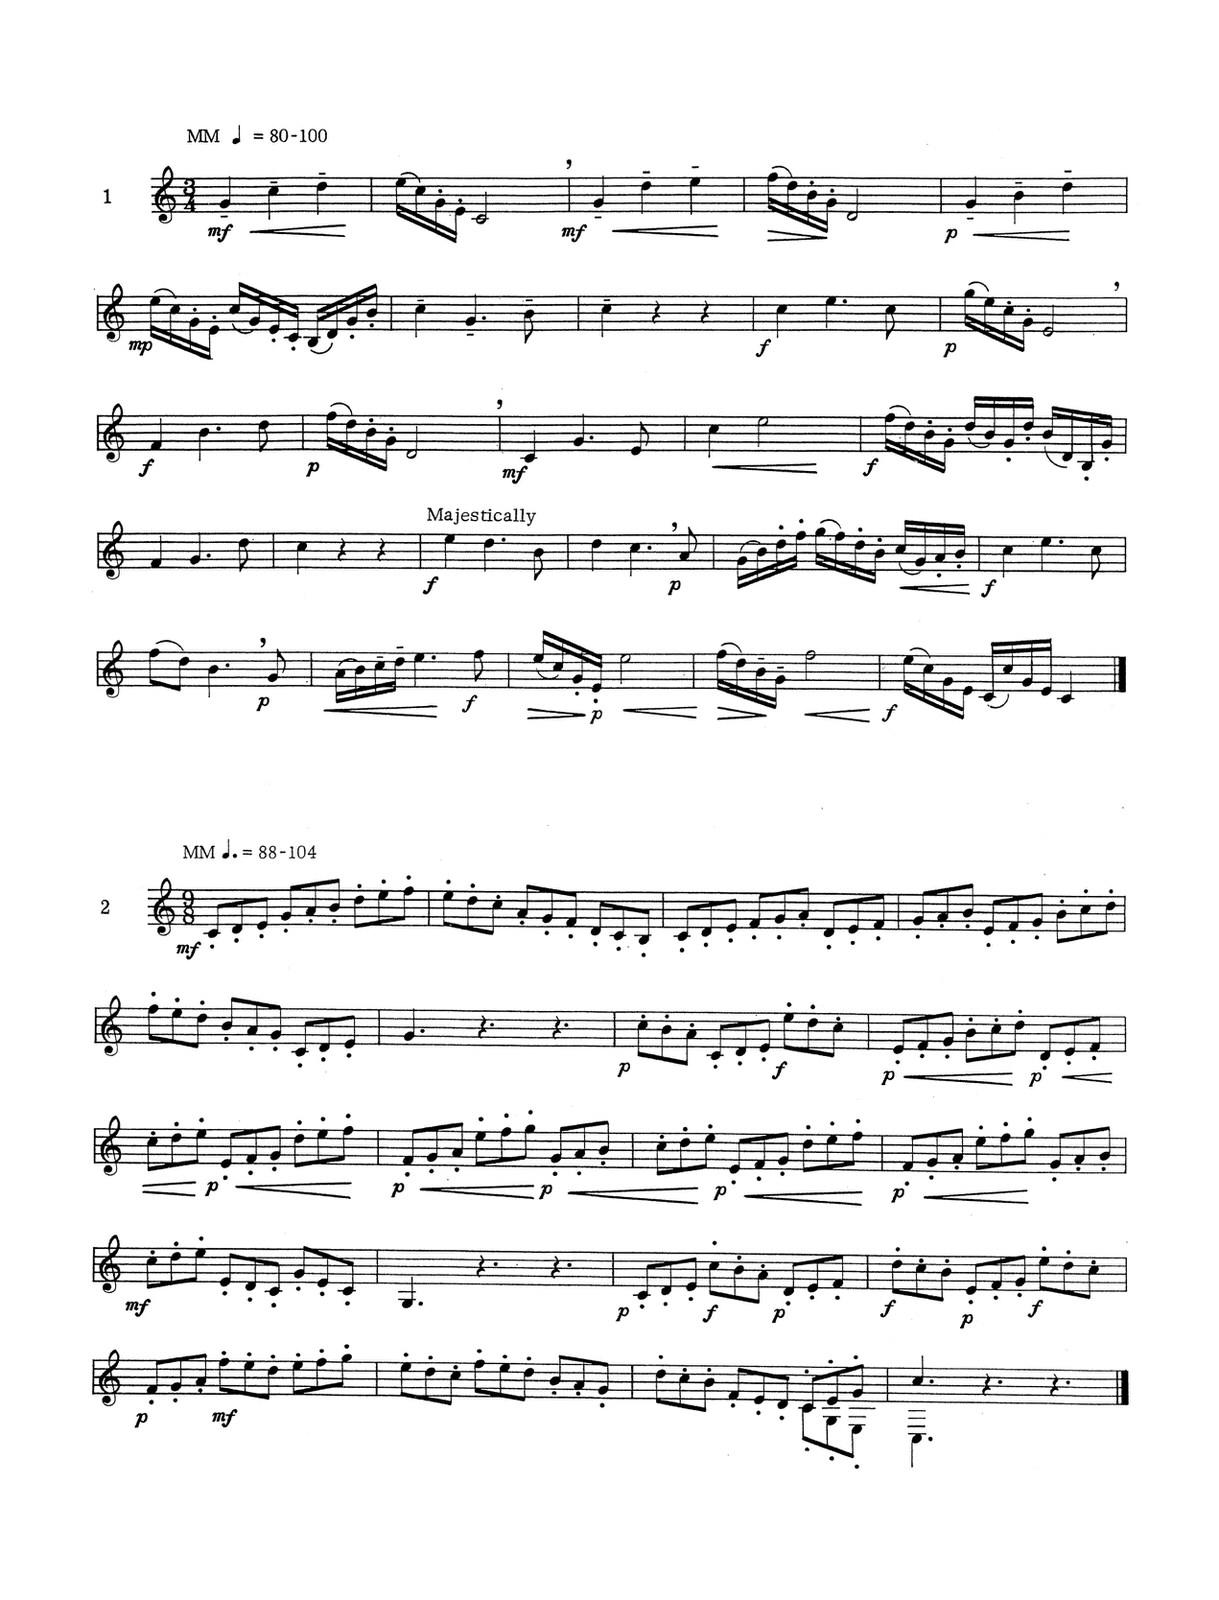 vanderwoude-pre-virtuoso-studies-2